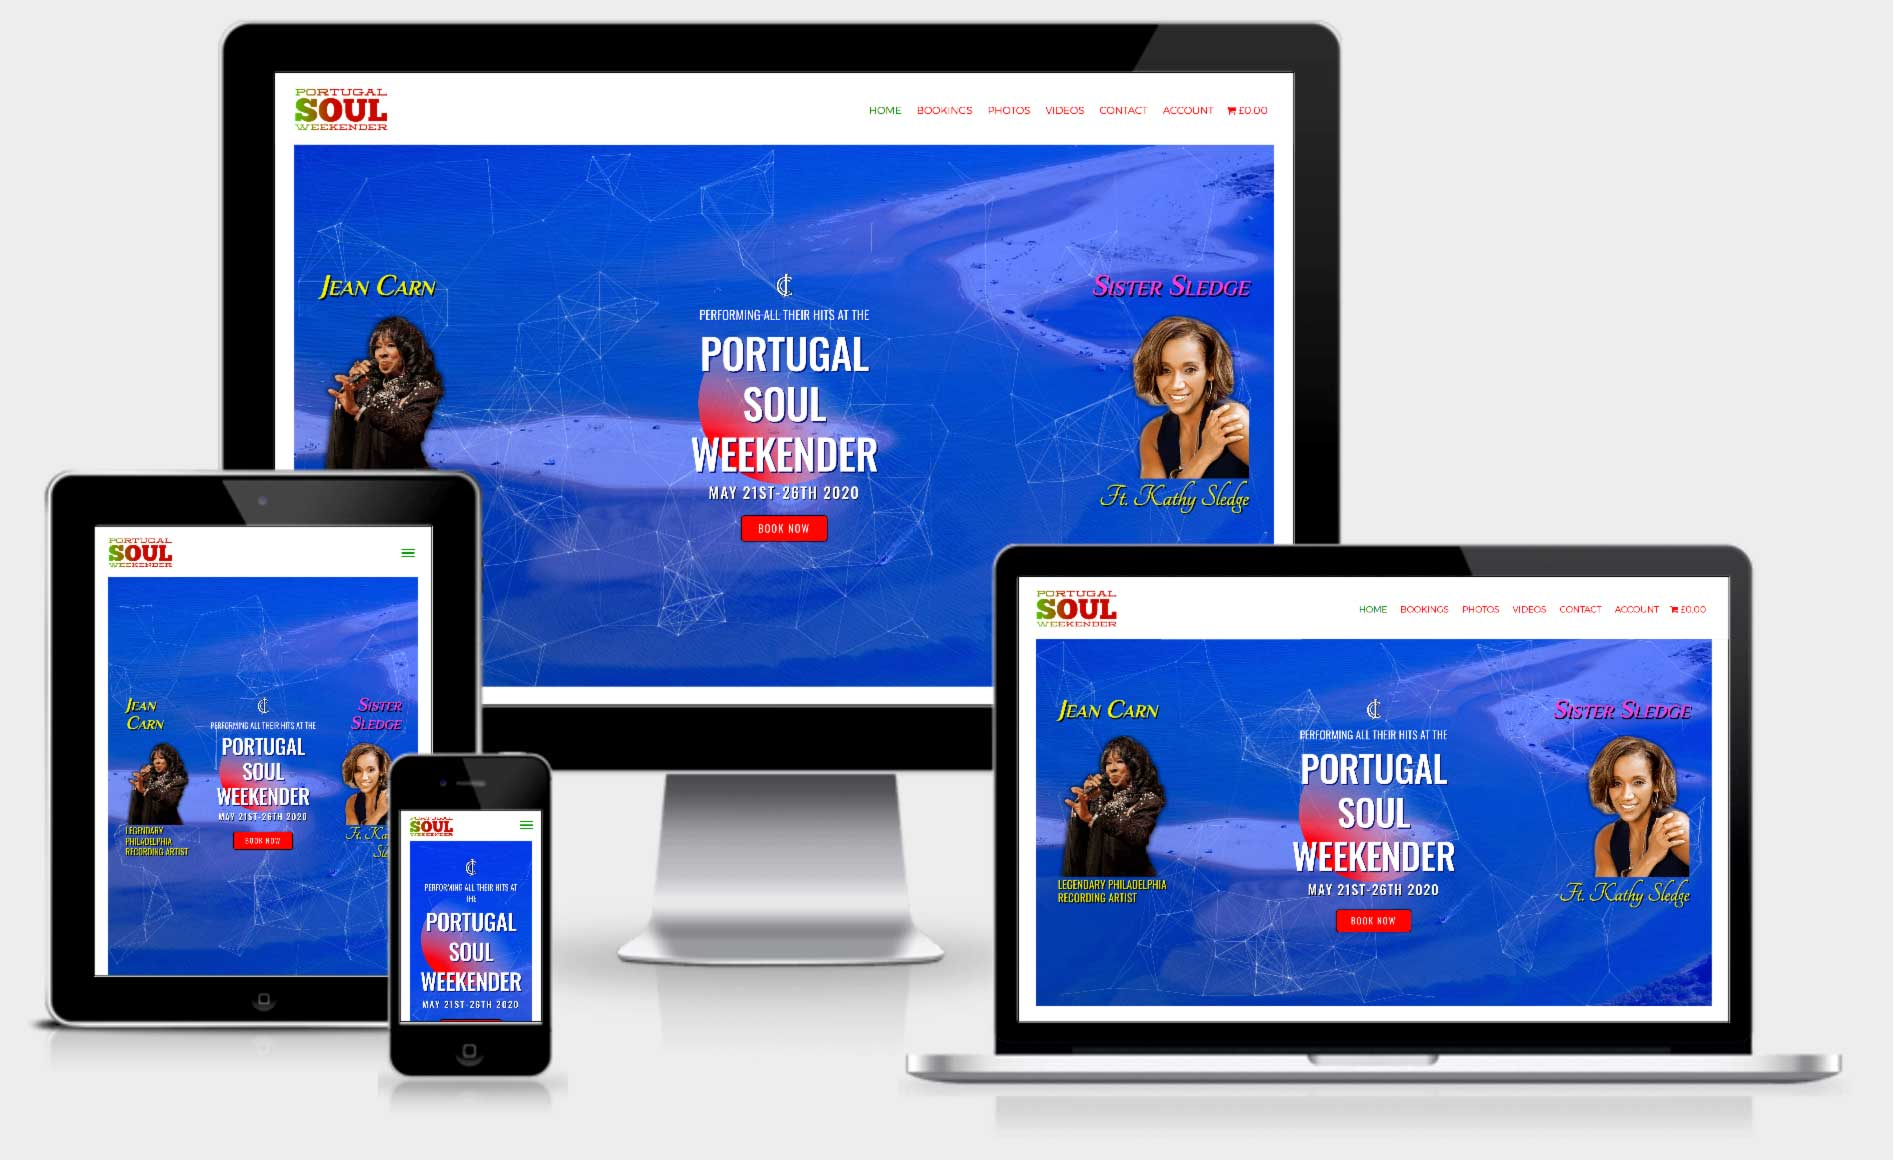 portugal-soul-weekender-mpower-webdesign-template